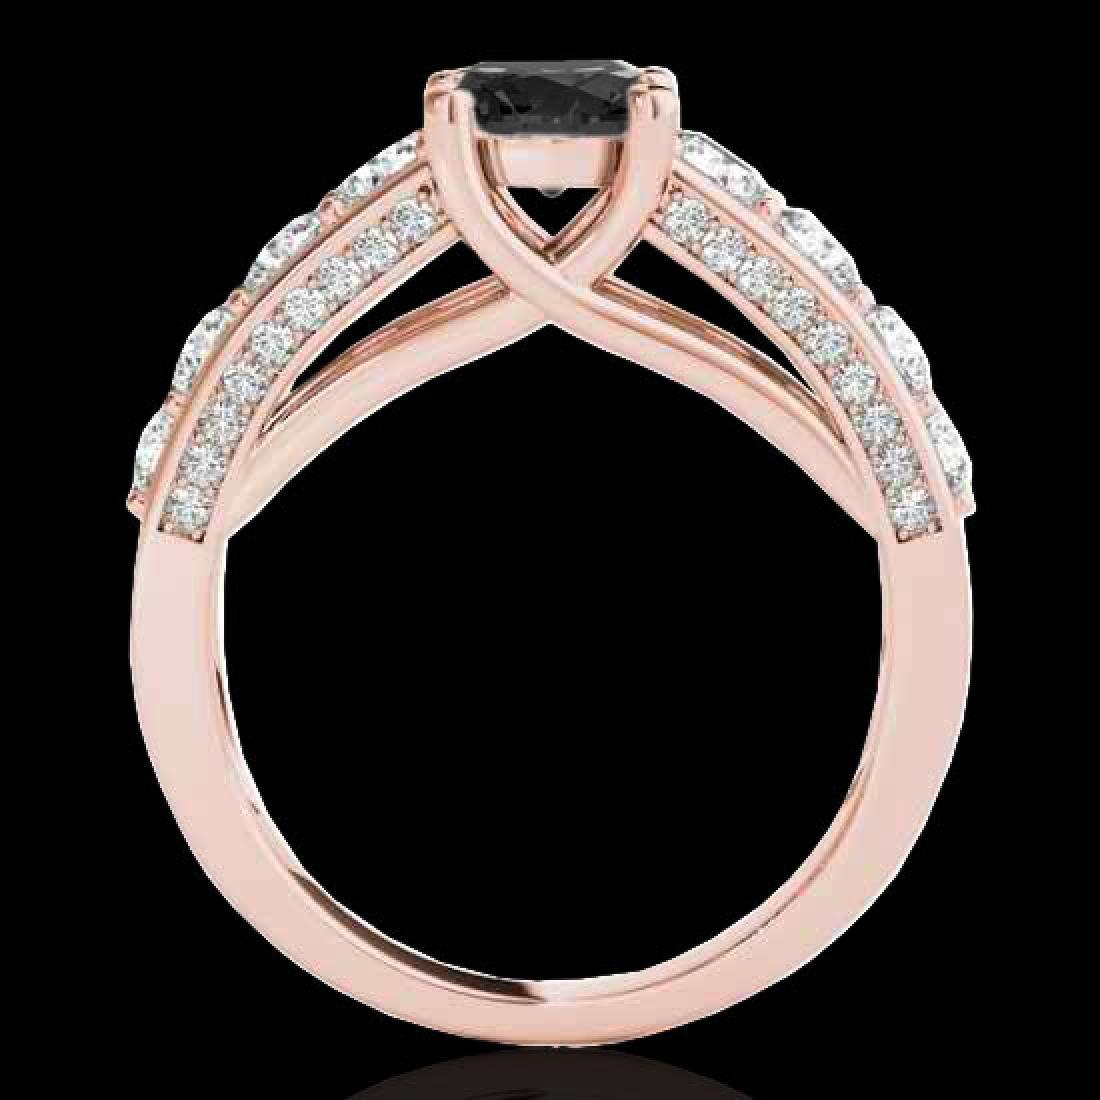 3.05 CTW Certified VS Black Diamond Solitaire Ring 10K - 2